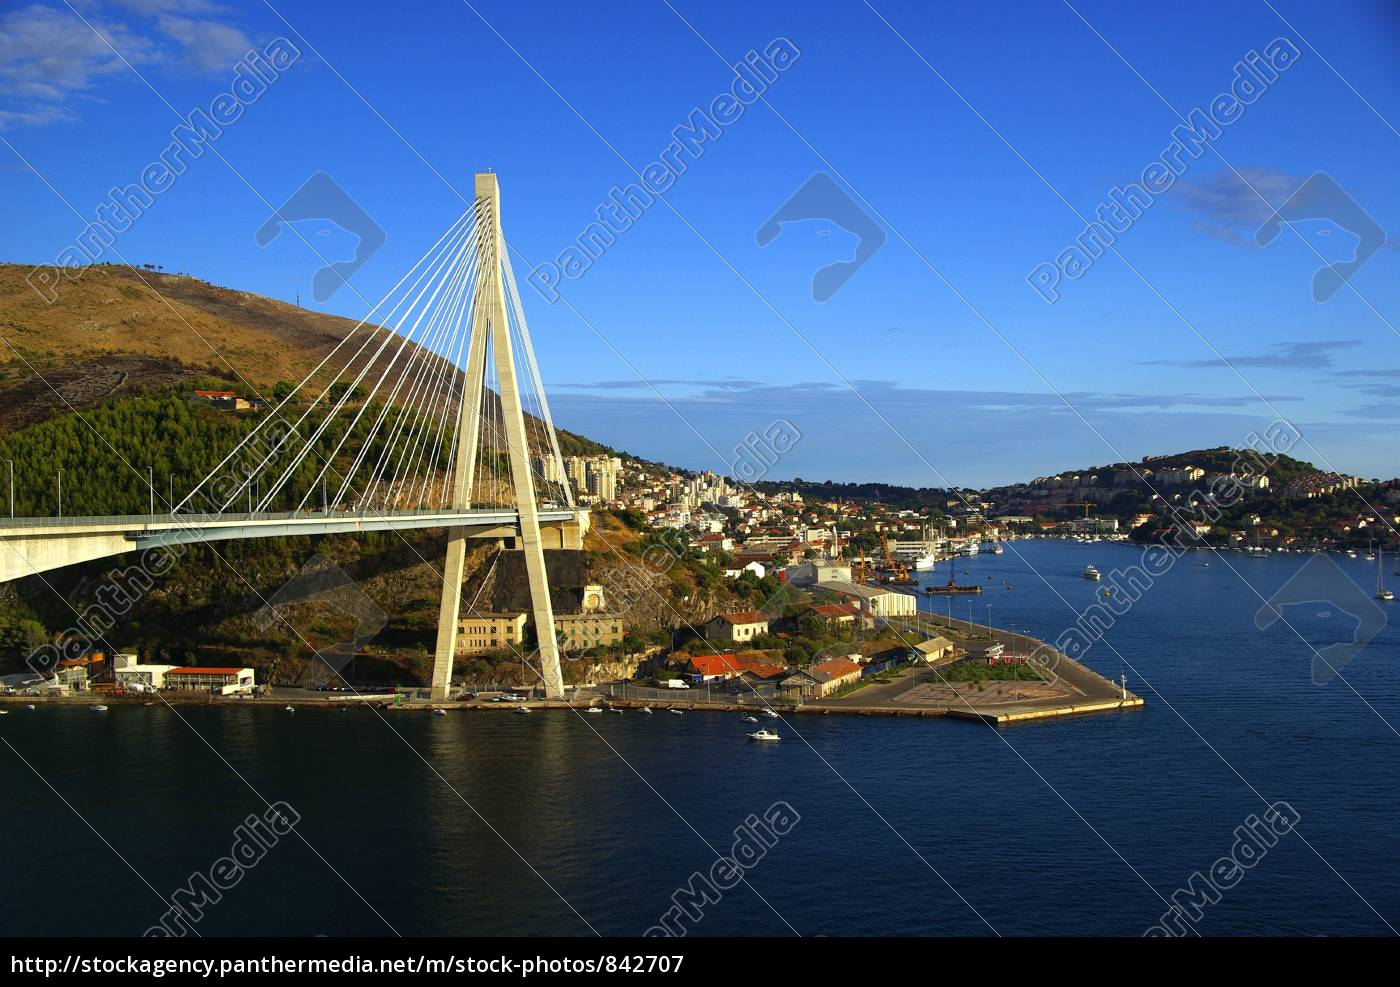 the, dubrovnik, bridge, 01 - 842707